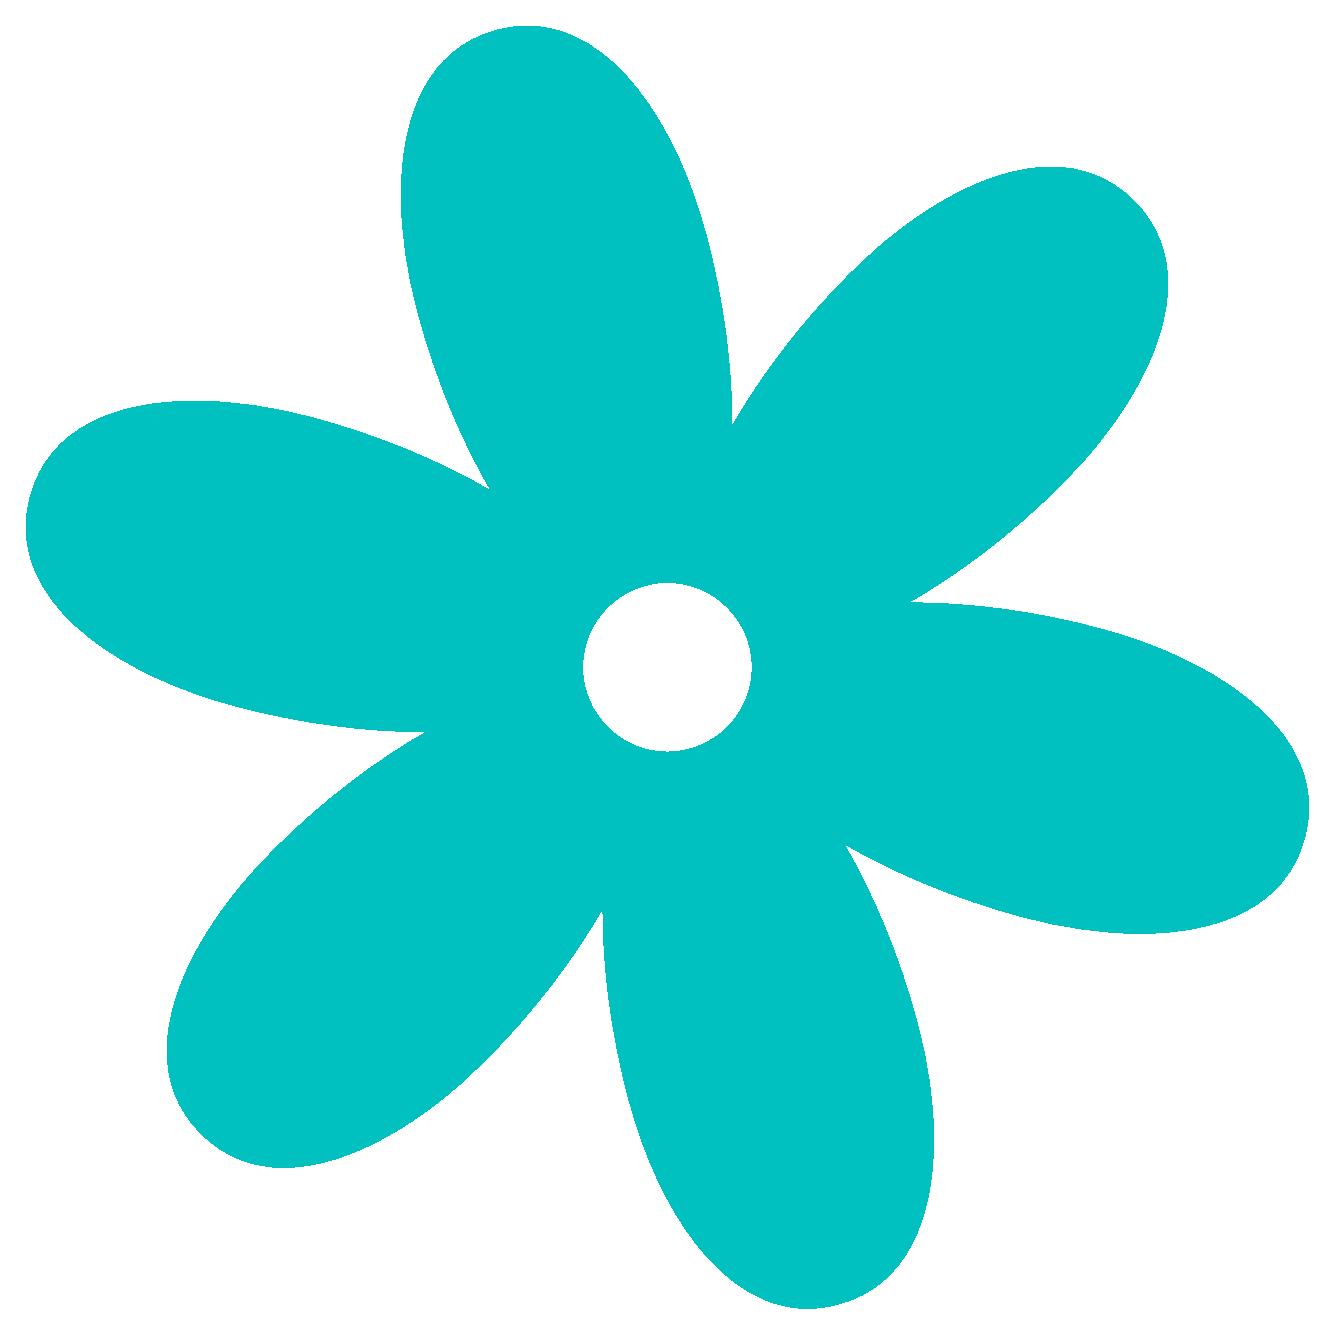 Free flower clip art graphics ... 5129f9-Free flower clip art graphics ... 5129f97c5e32a912a0aaba562be5a7 .-14